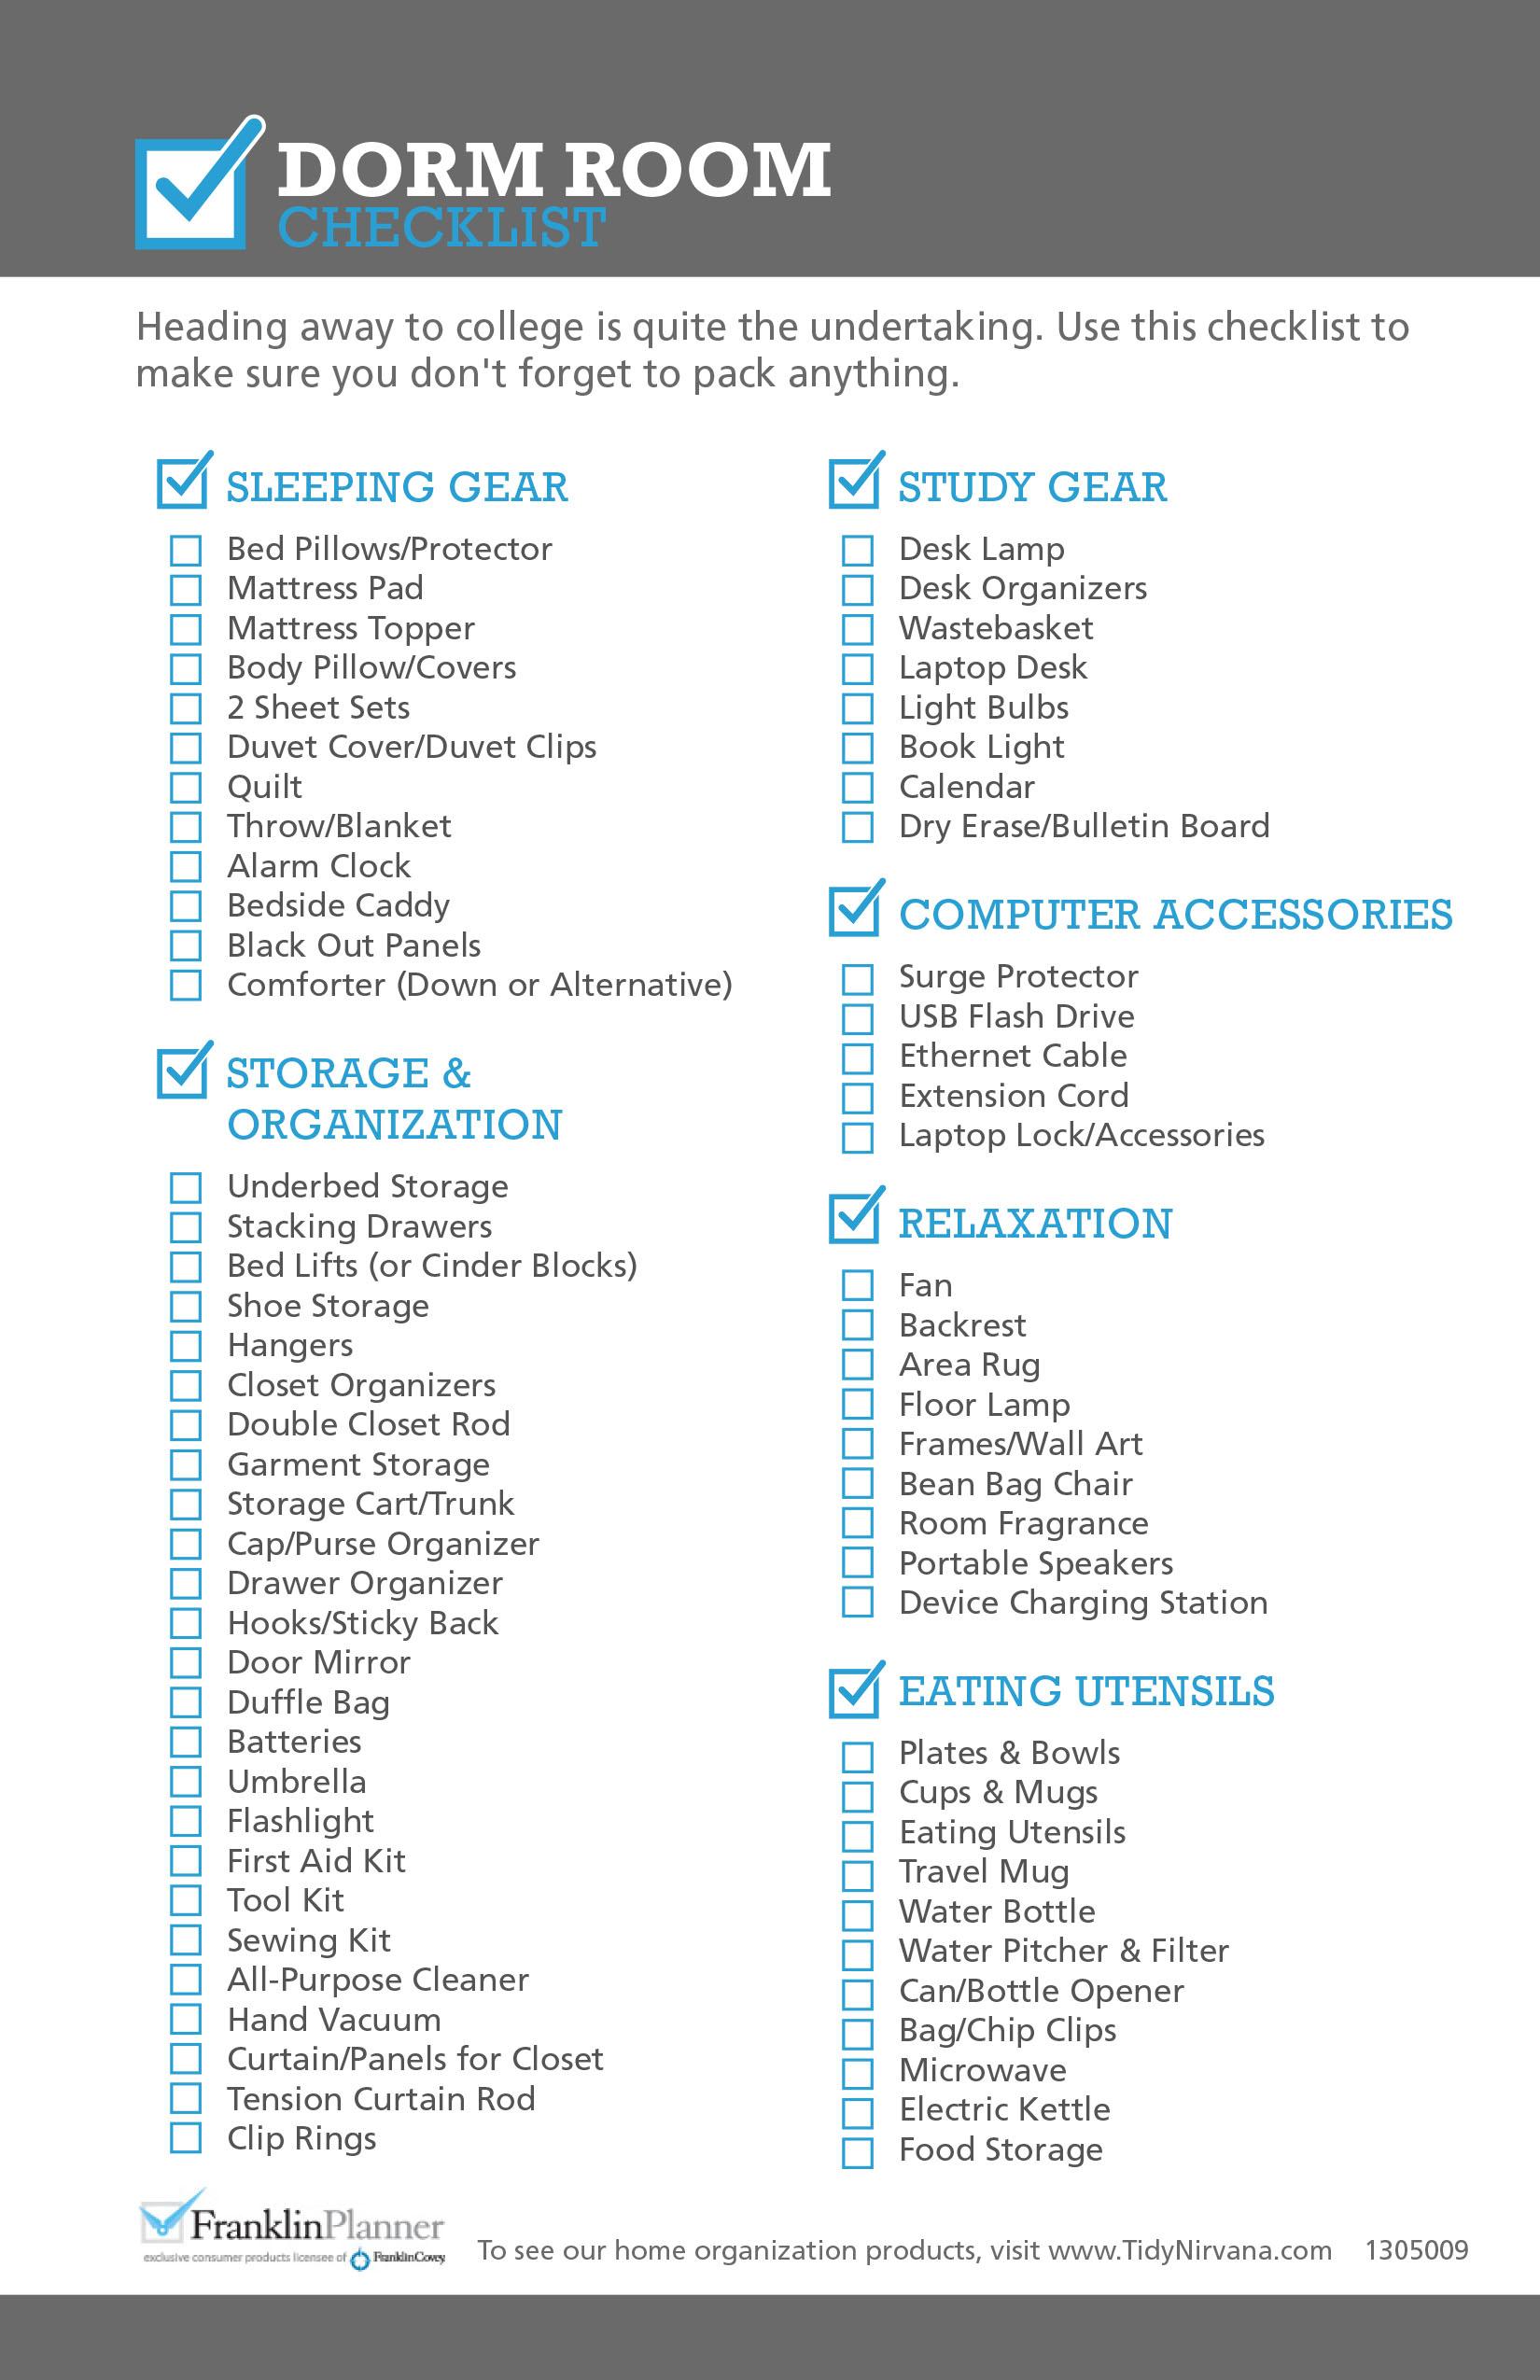 Classic Size Dorm Room Checklist